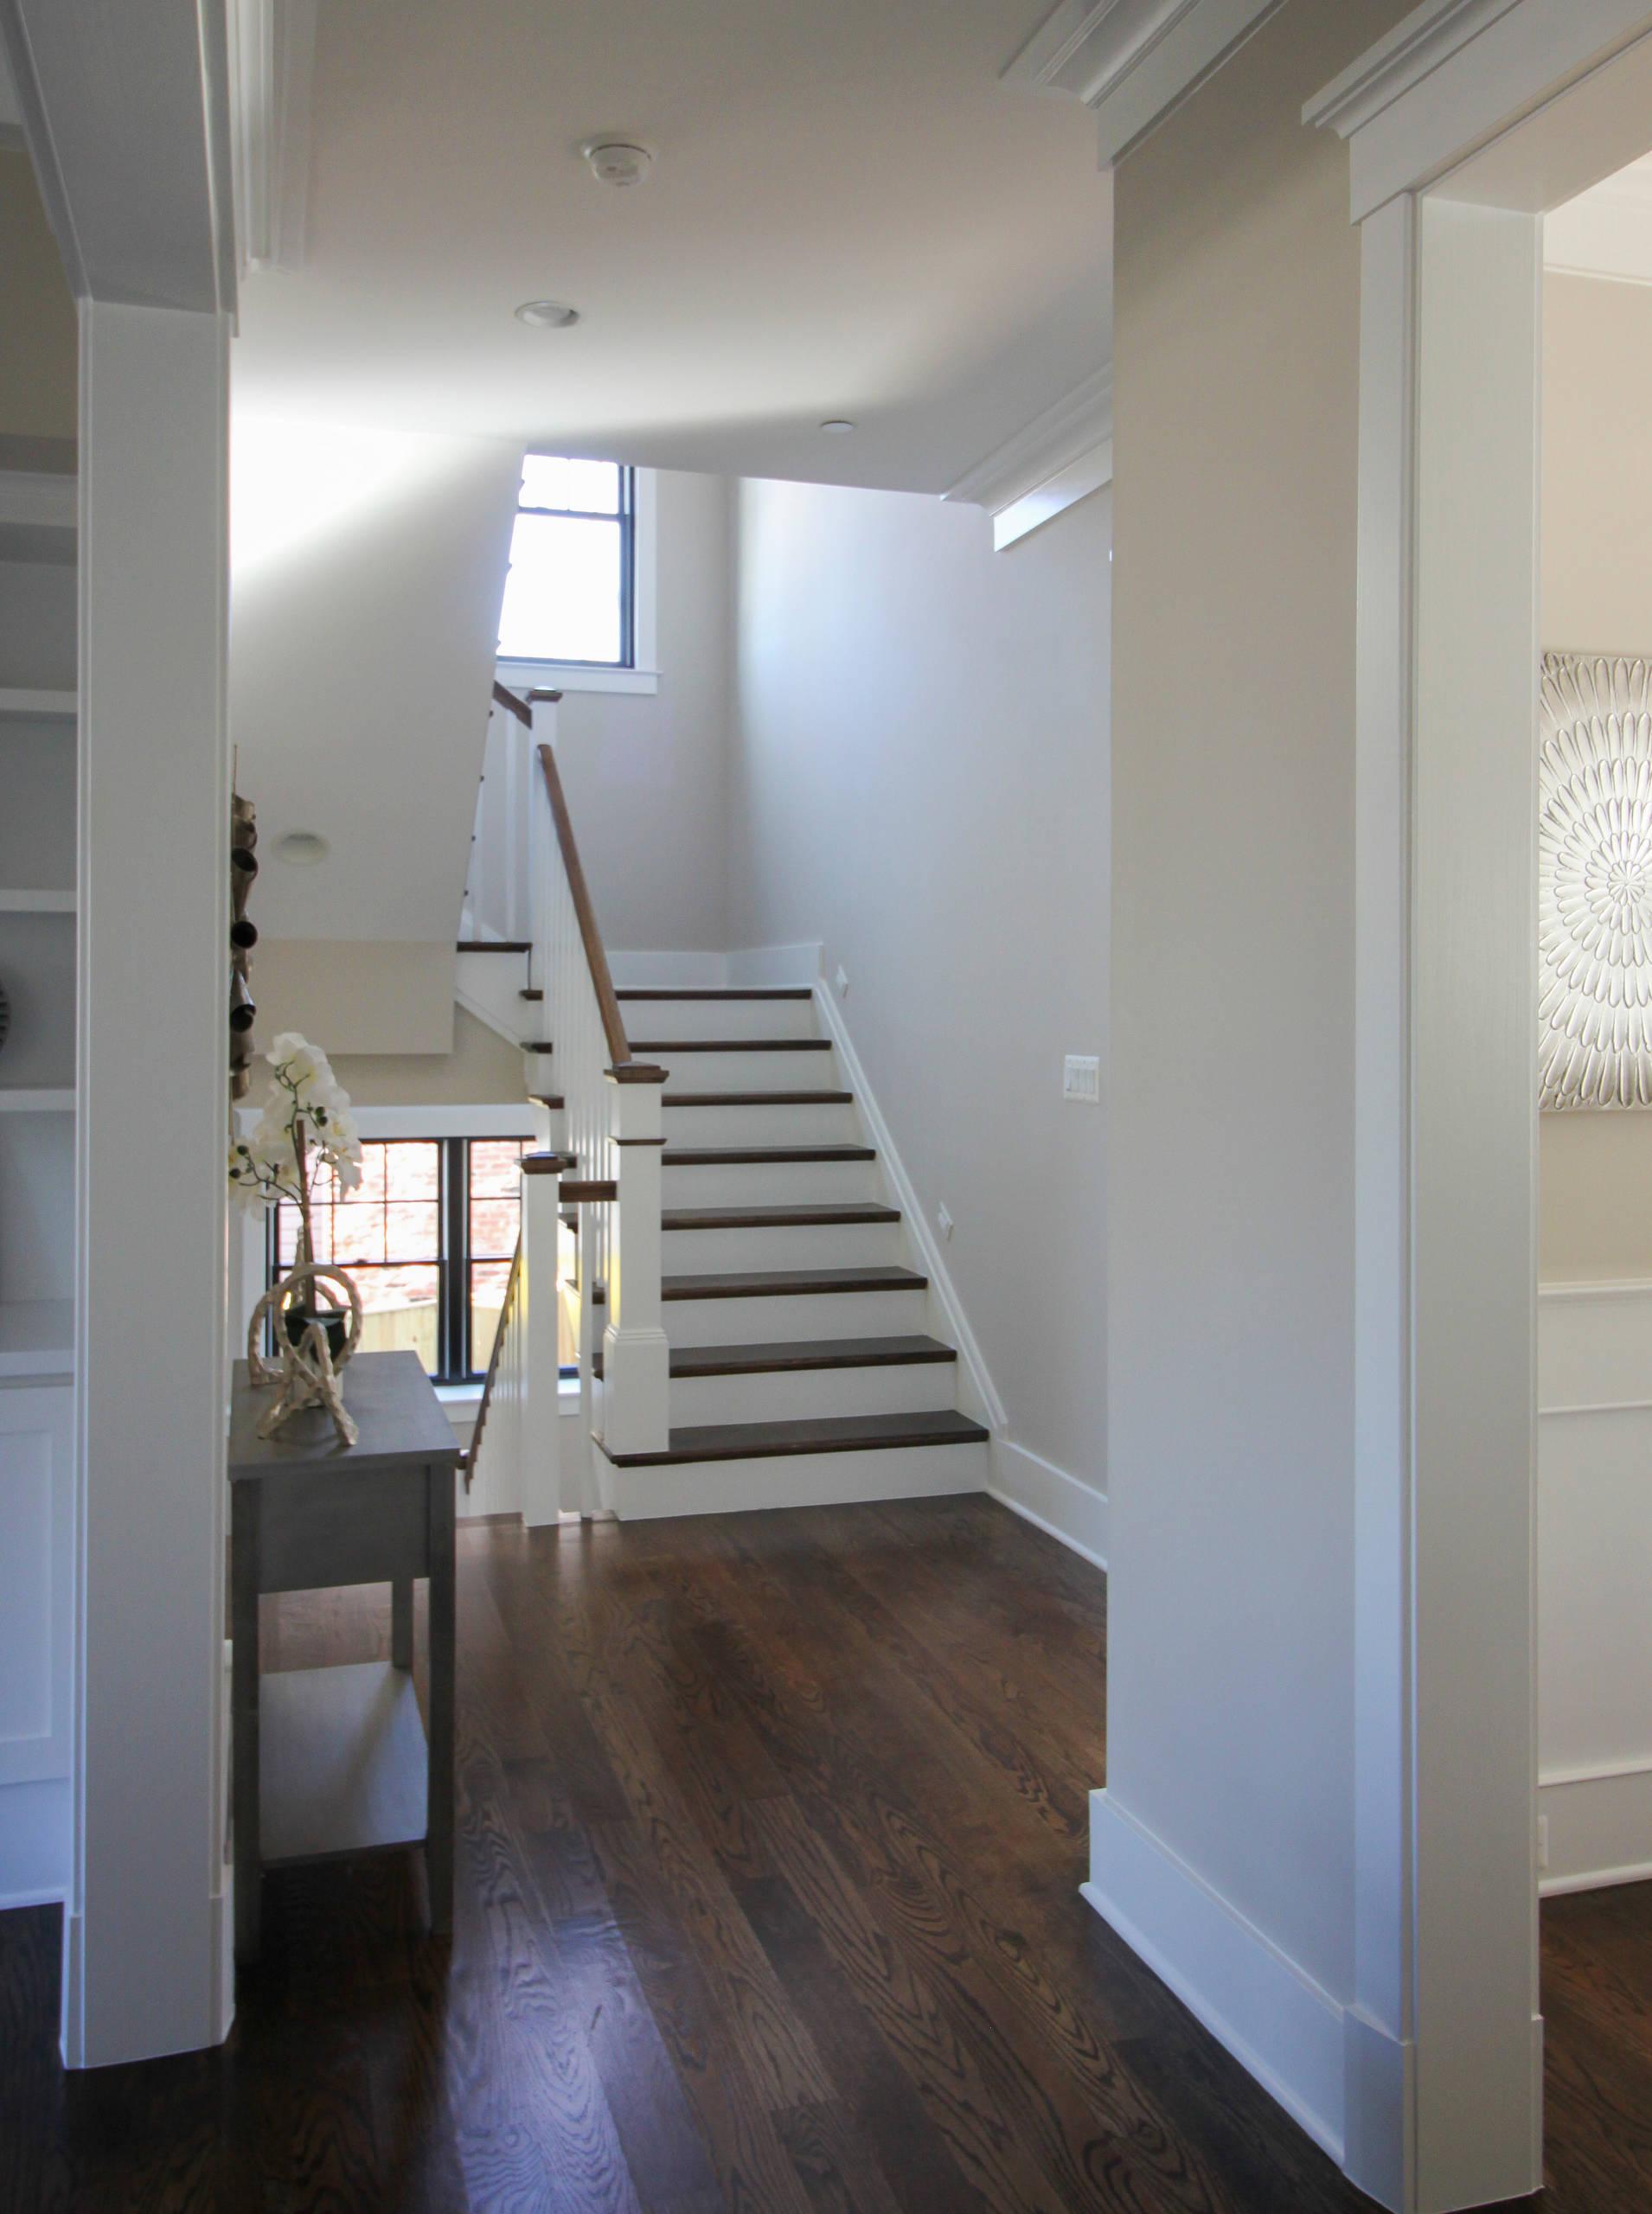 57_Modern & Comfortable Cupboard Under Basement Stairs, Bethesda MD 20817